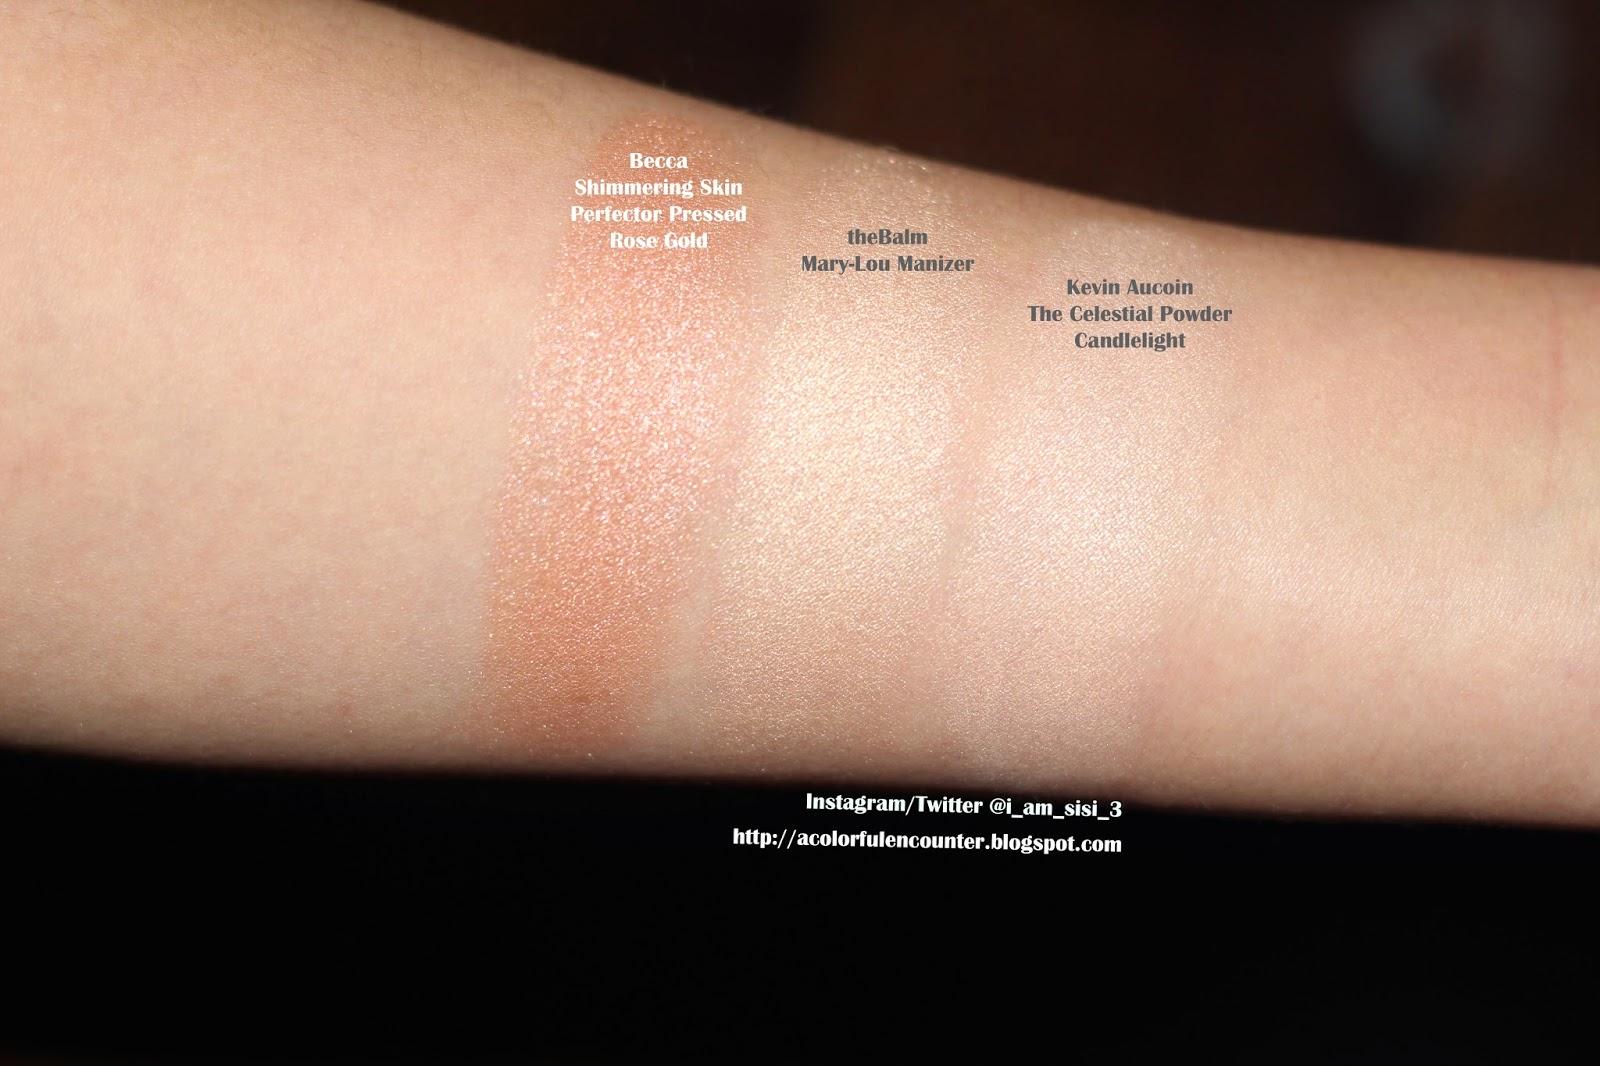 Shimmering Skin Perfector Natural Light